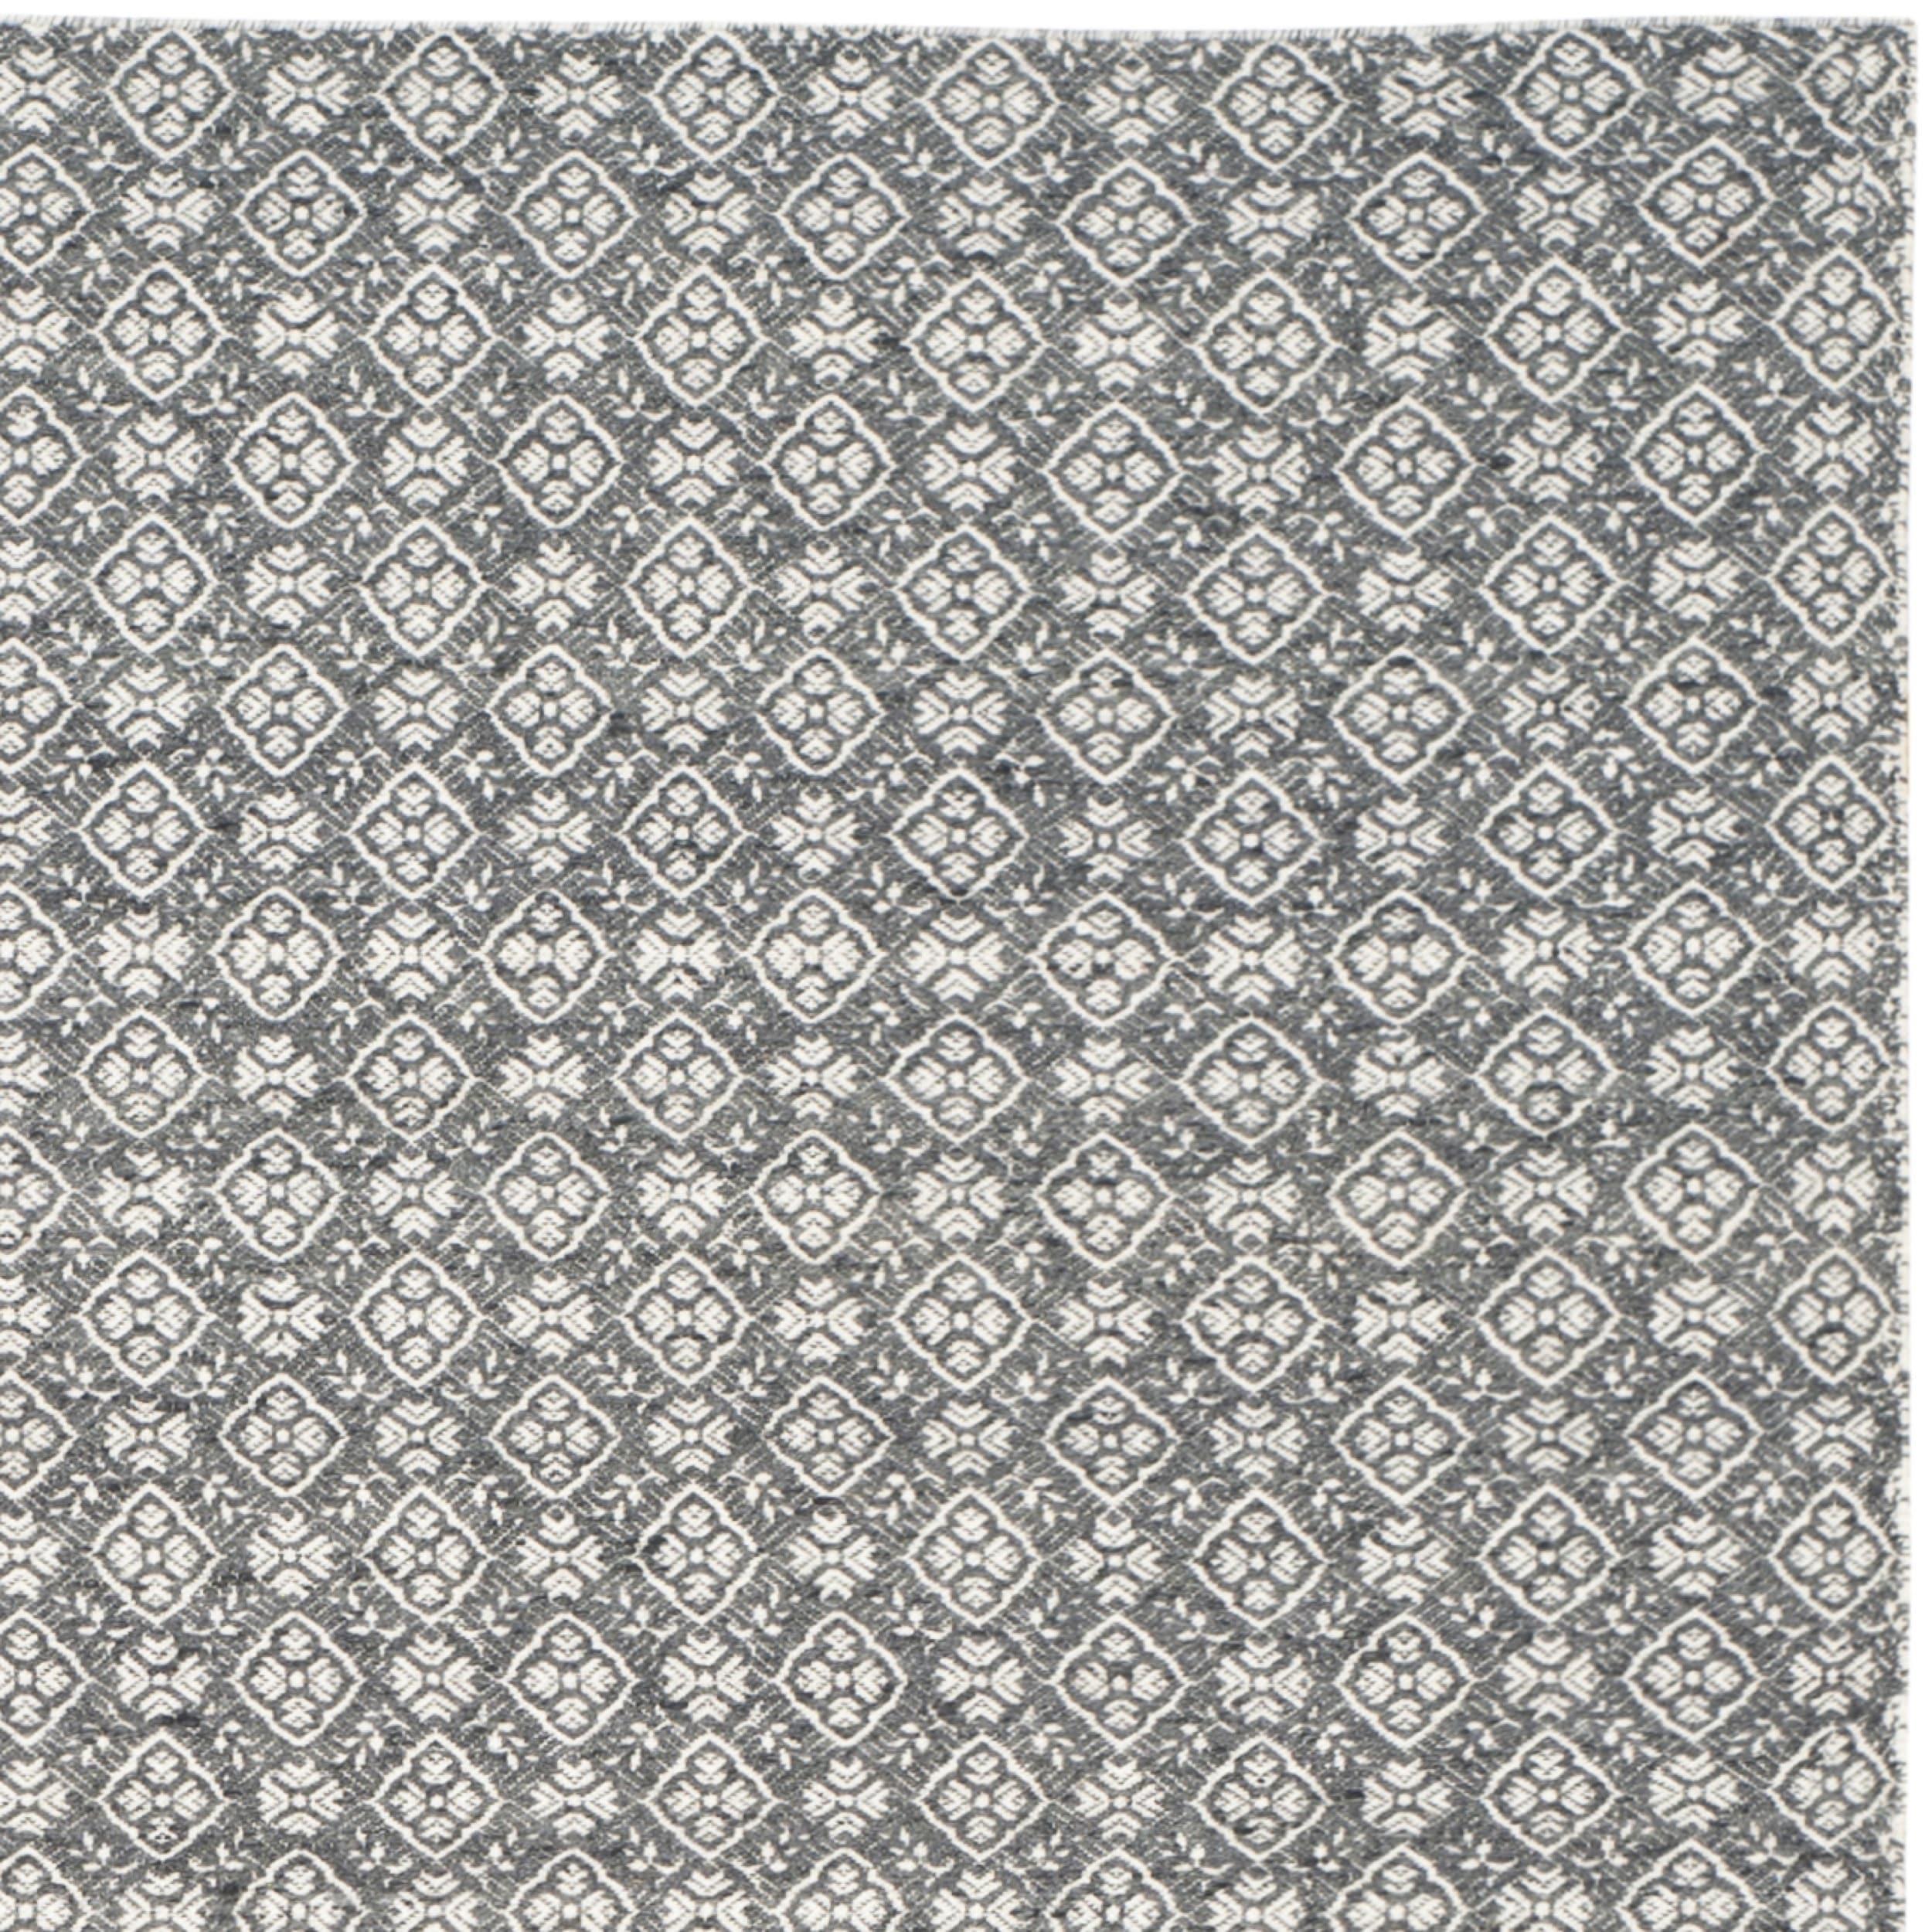 Safavieh Hand Woven Kilim Ivory Charcoal Wool Rug  5 X